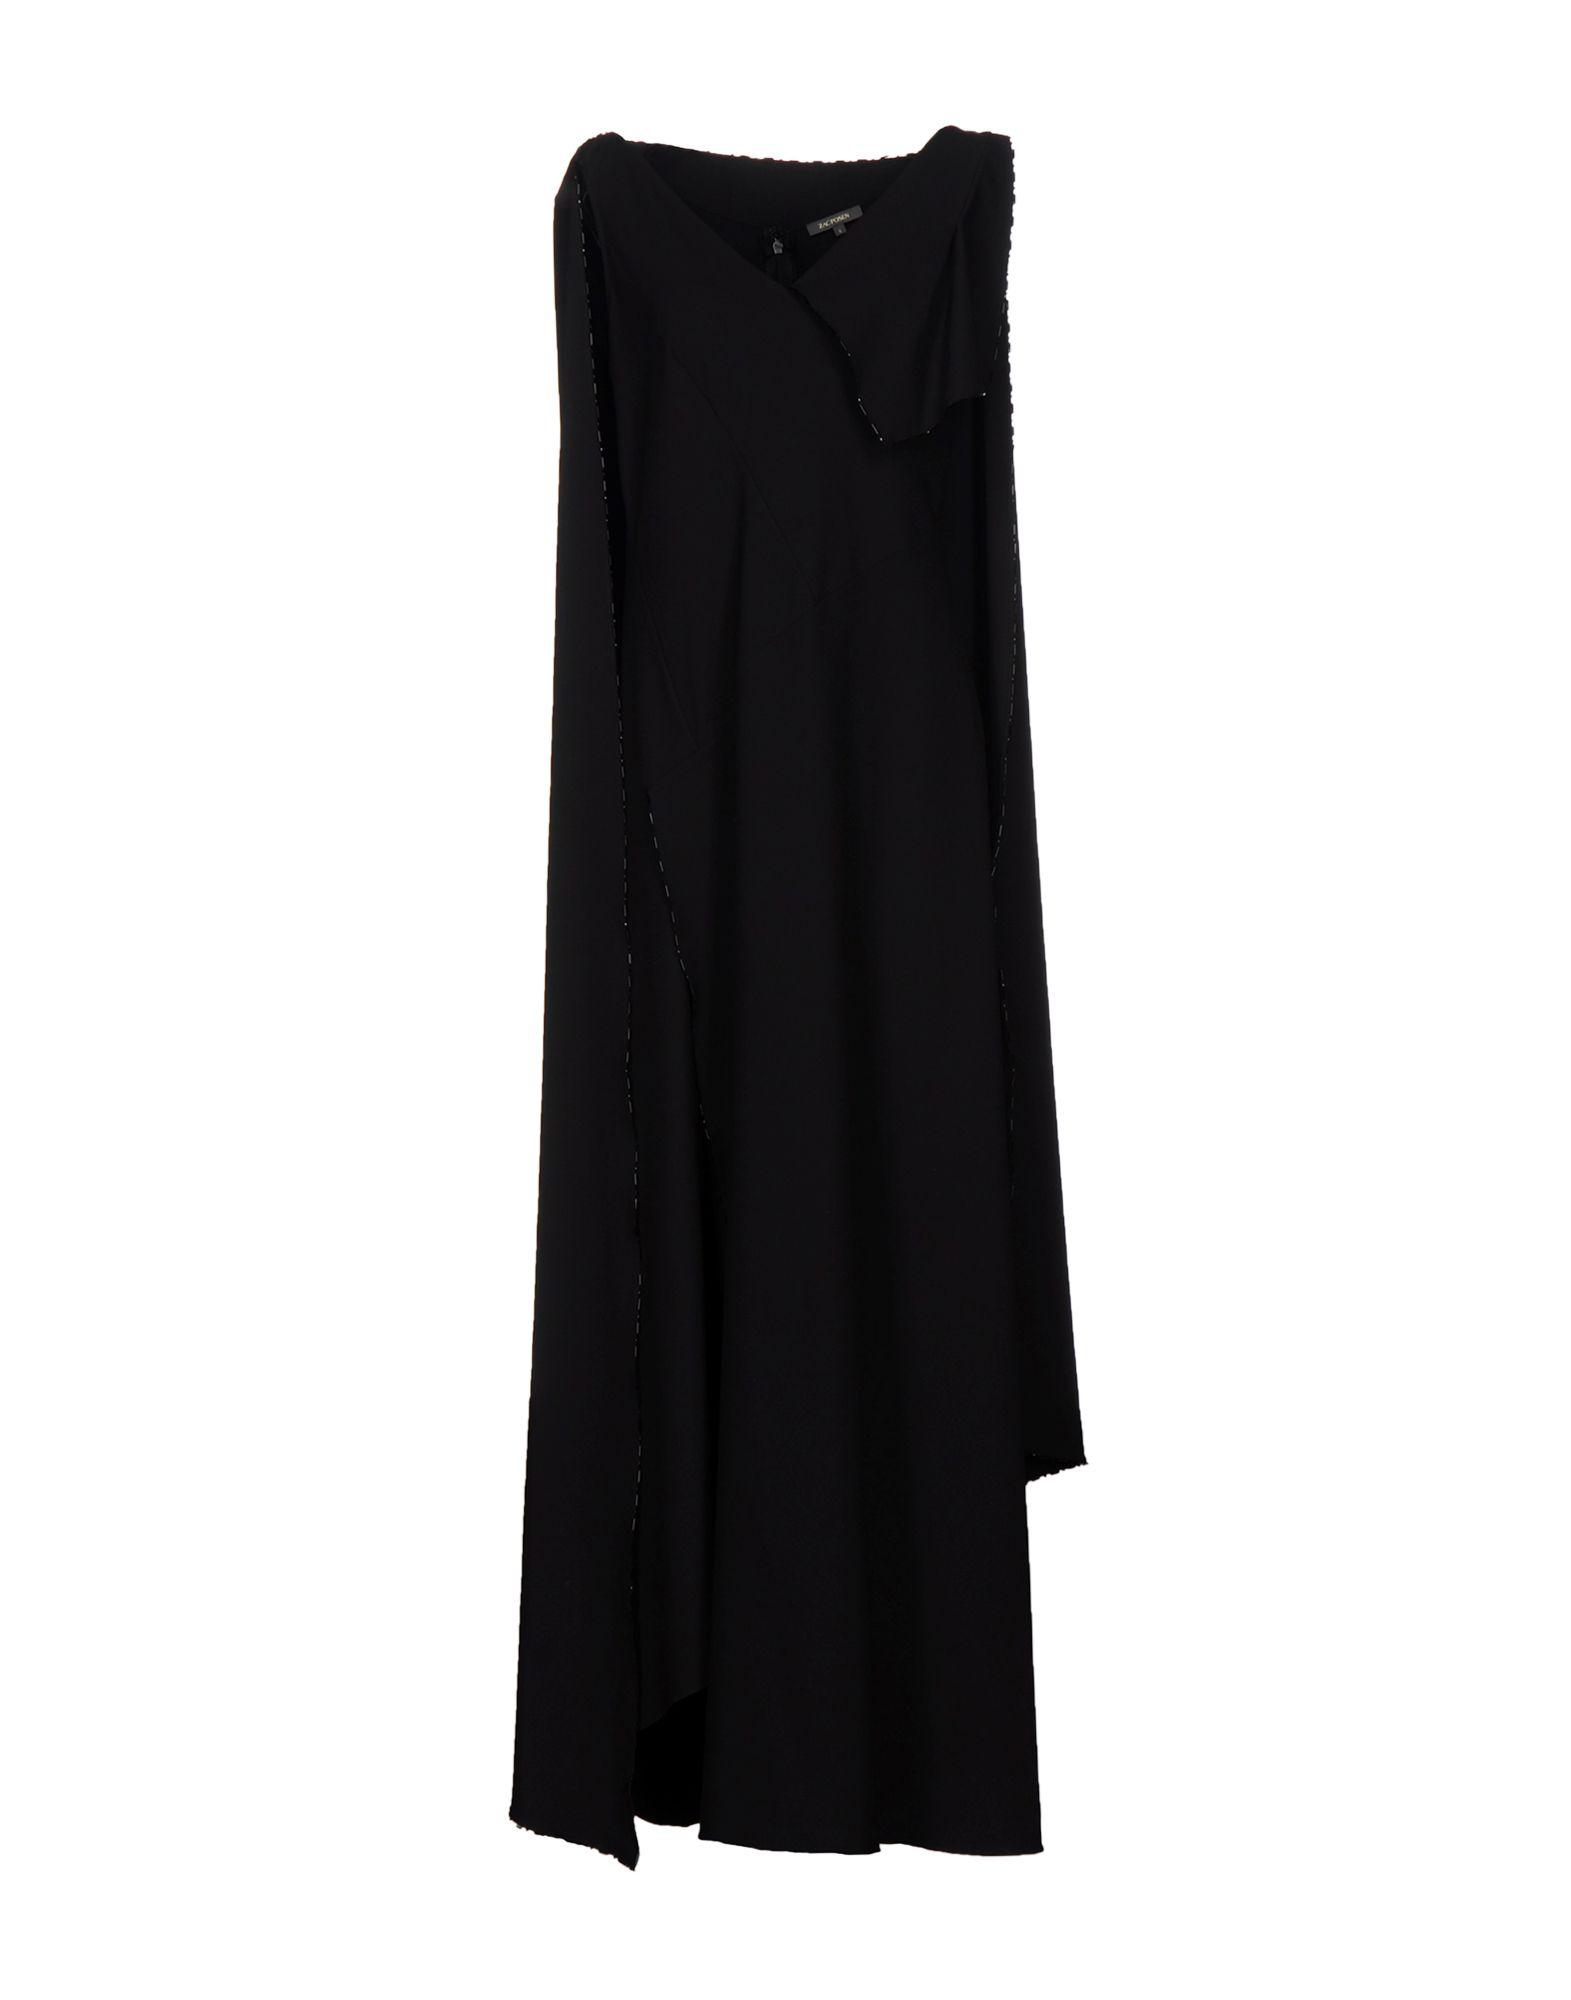 ZAC POSEN Длинное платье цены онлайн